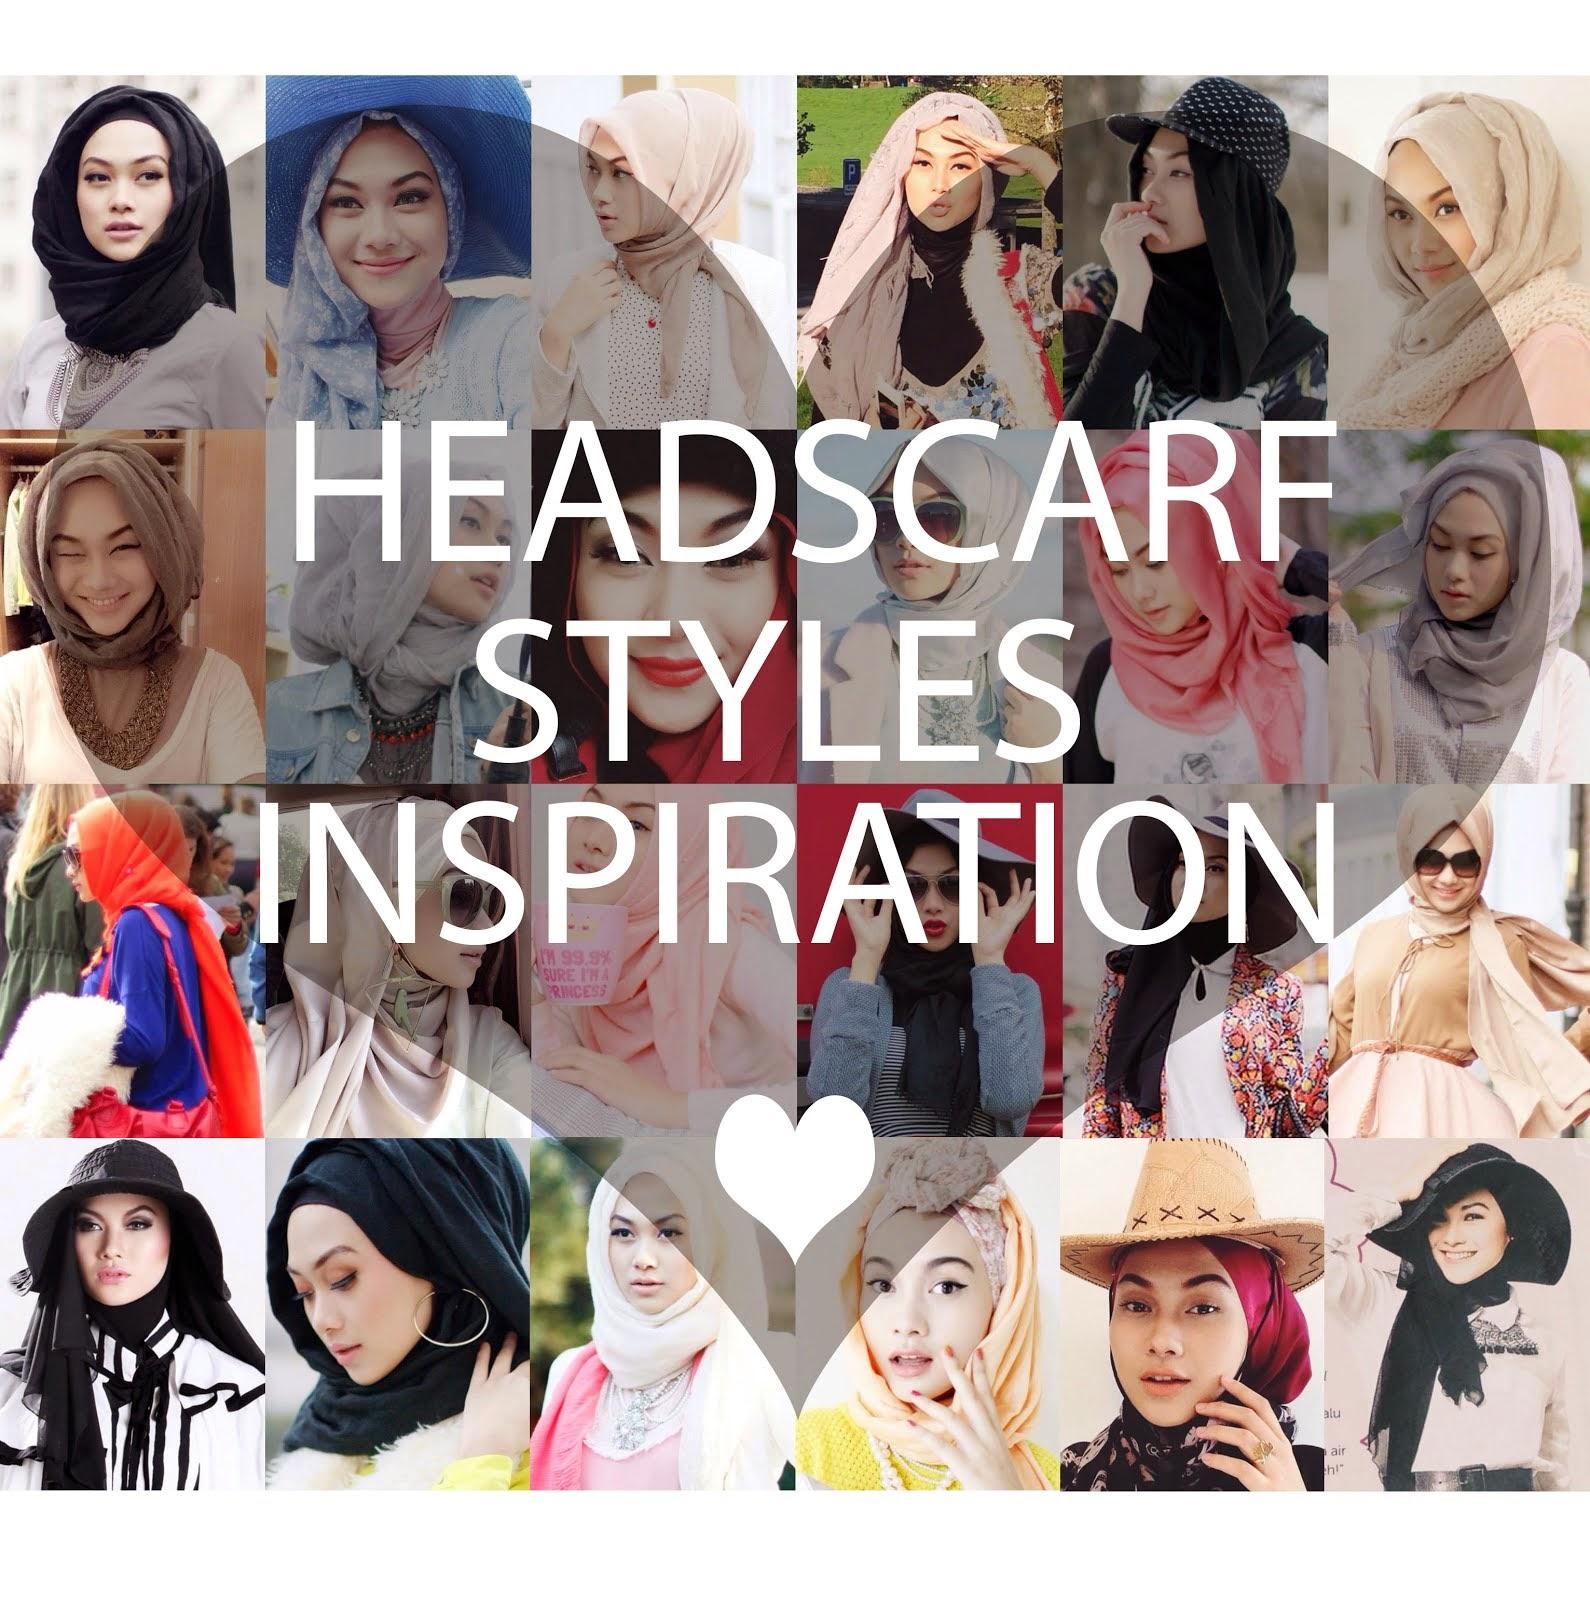 HEADSCARF STYLES INSPIRATION